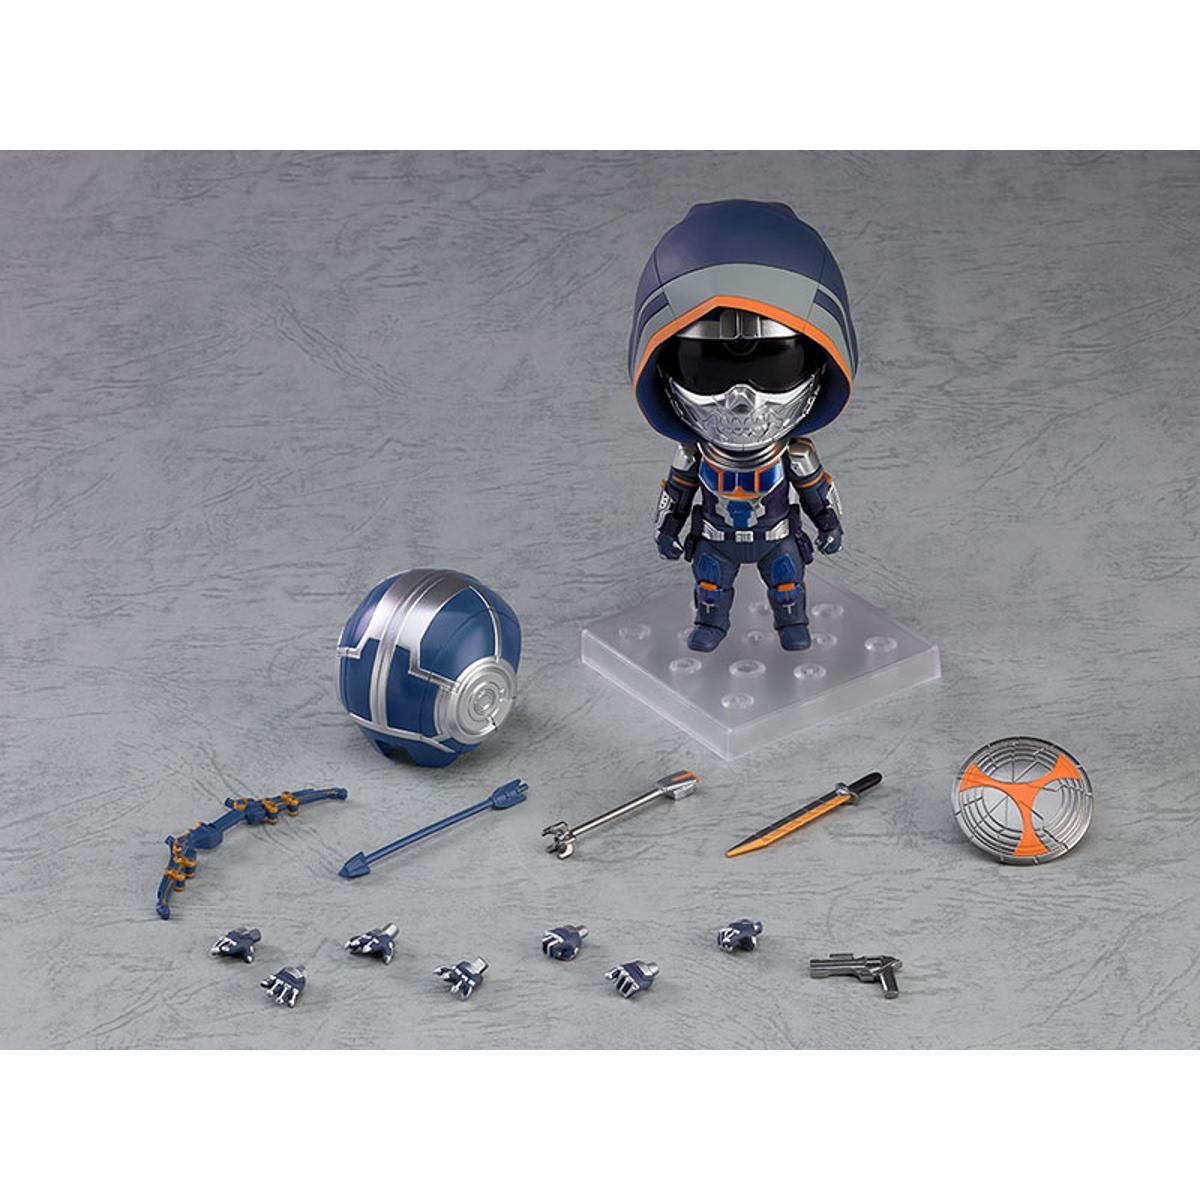 Nendoroid Taskmaster: Black Widow Ver. DX